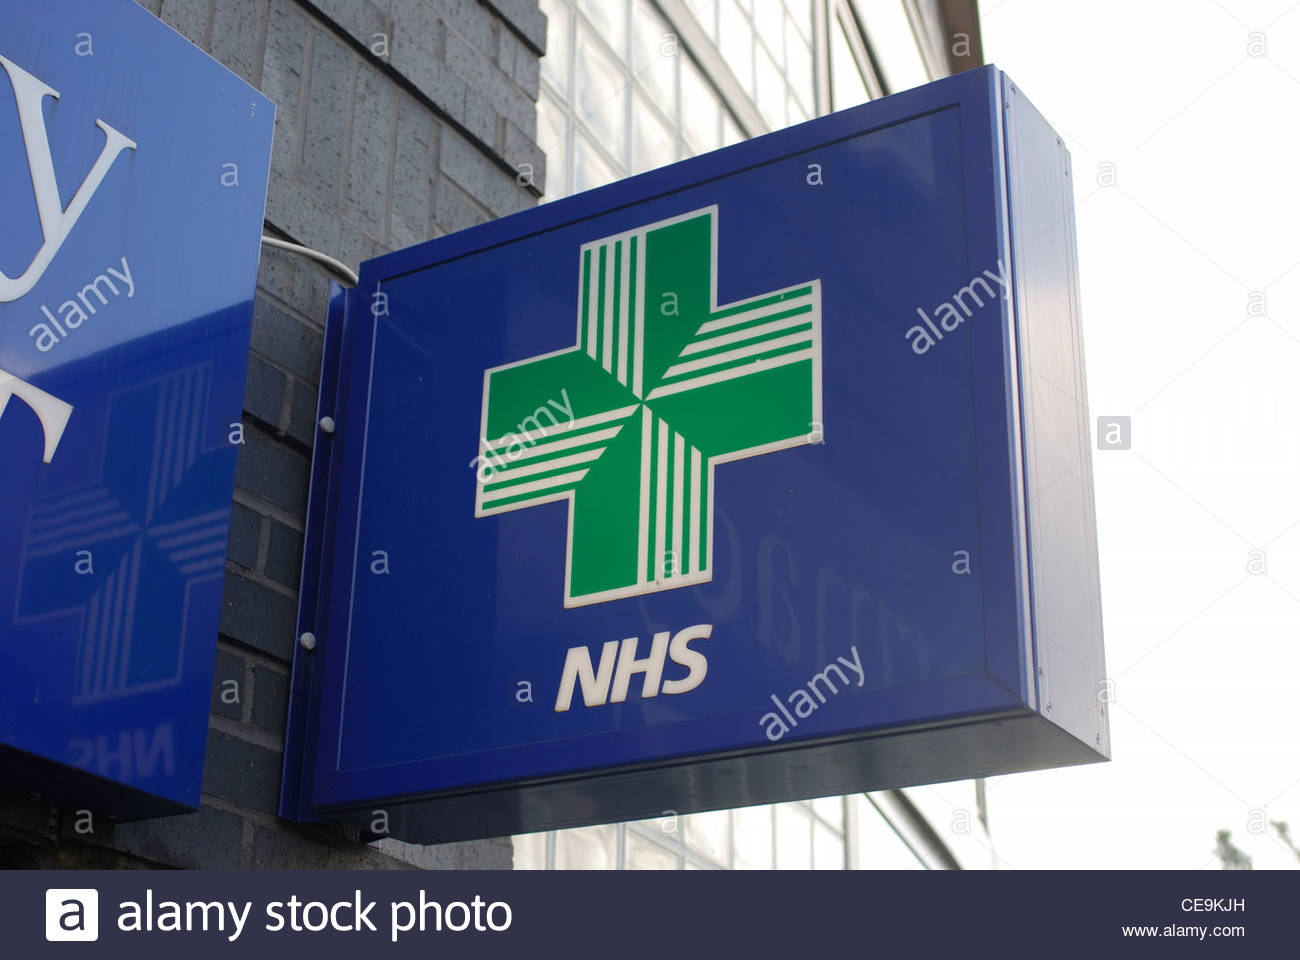 Southampton United Kingdom NHS pharmacy sign - Stock Image